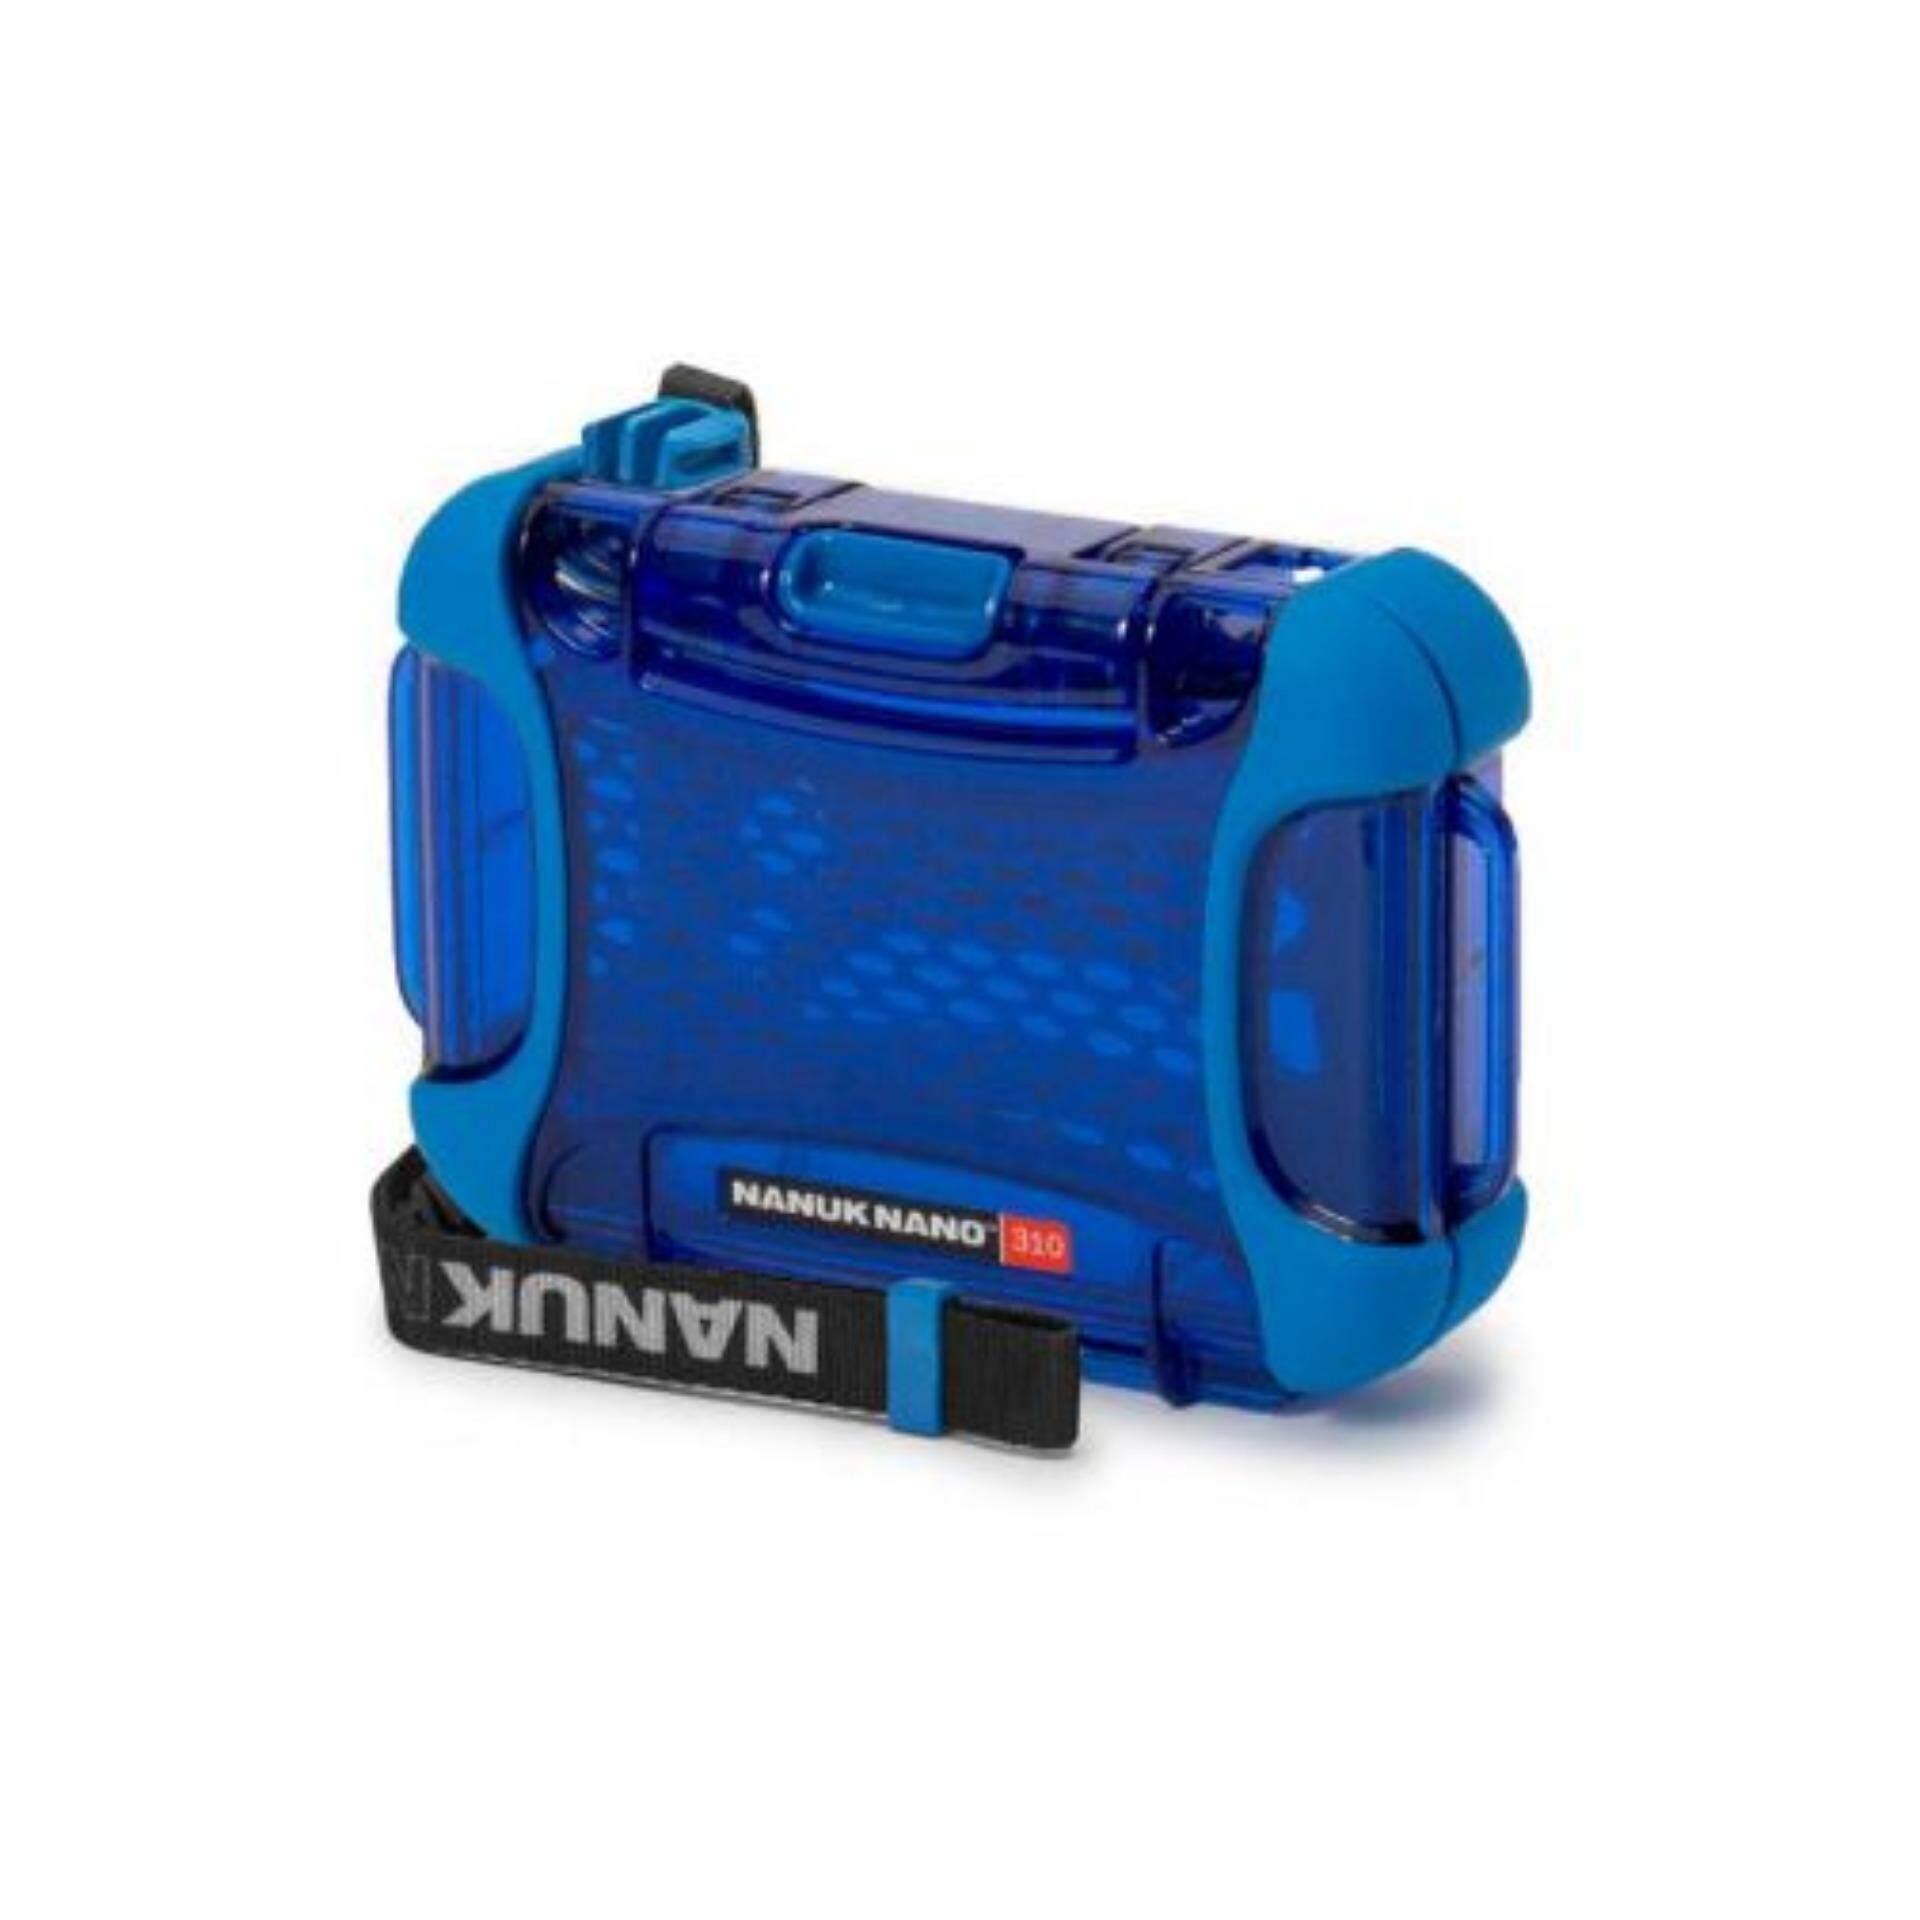 Case Casing Iphone 66s Premium Hardcase Dove Polkadot Hijau Daftar Nanuk 310 Nano Series Waterproof Small Hard For Phones And Camera Biru Cameras Electronics